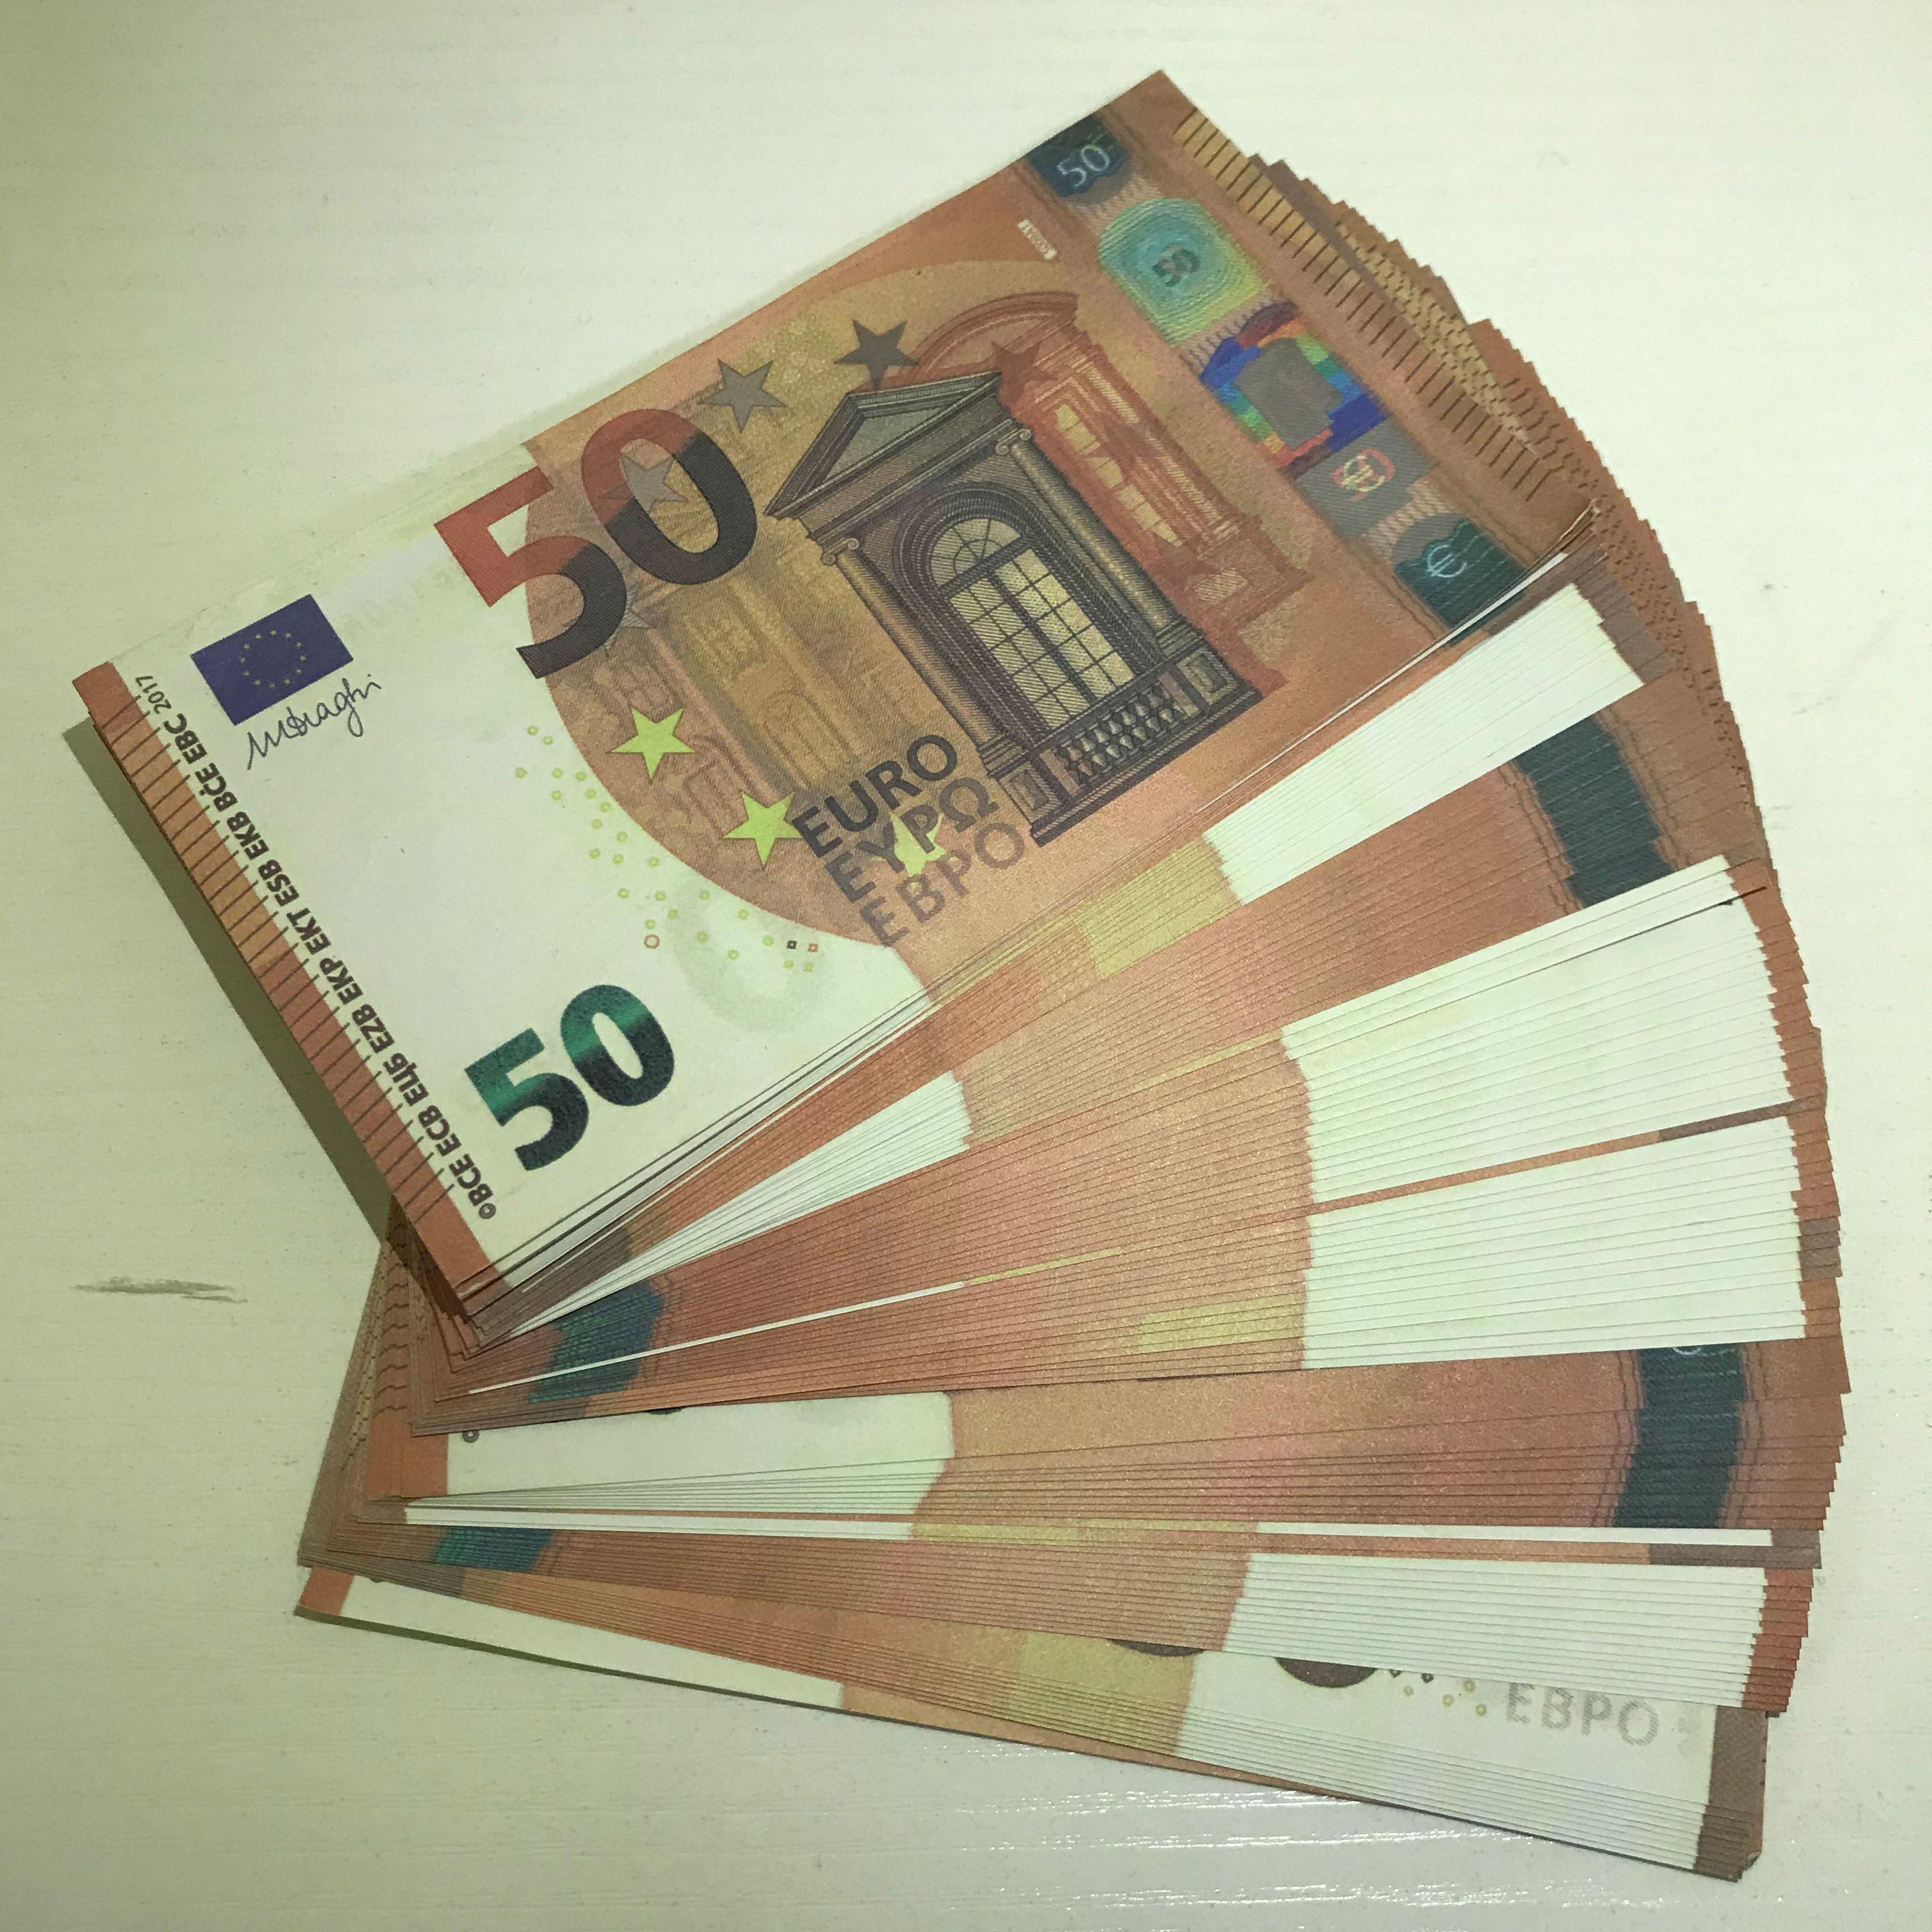 Hot Banknote LE50-40 Shooting Atmosphäre Spielzeug MV Fälschung Prop 50 bar Prop Gefälligkeit Euro Copy Party Bühne SGSFP Jatoa